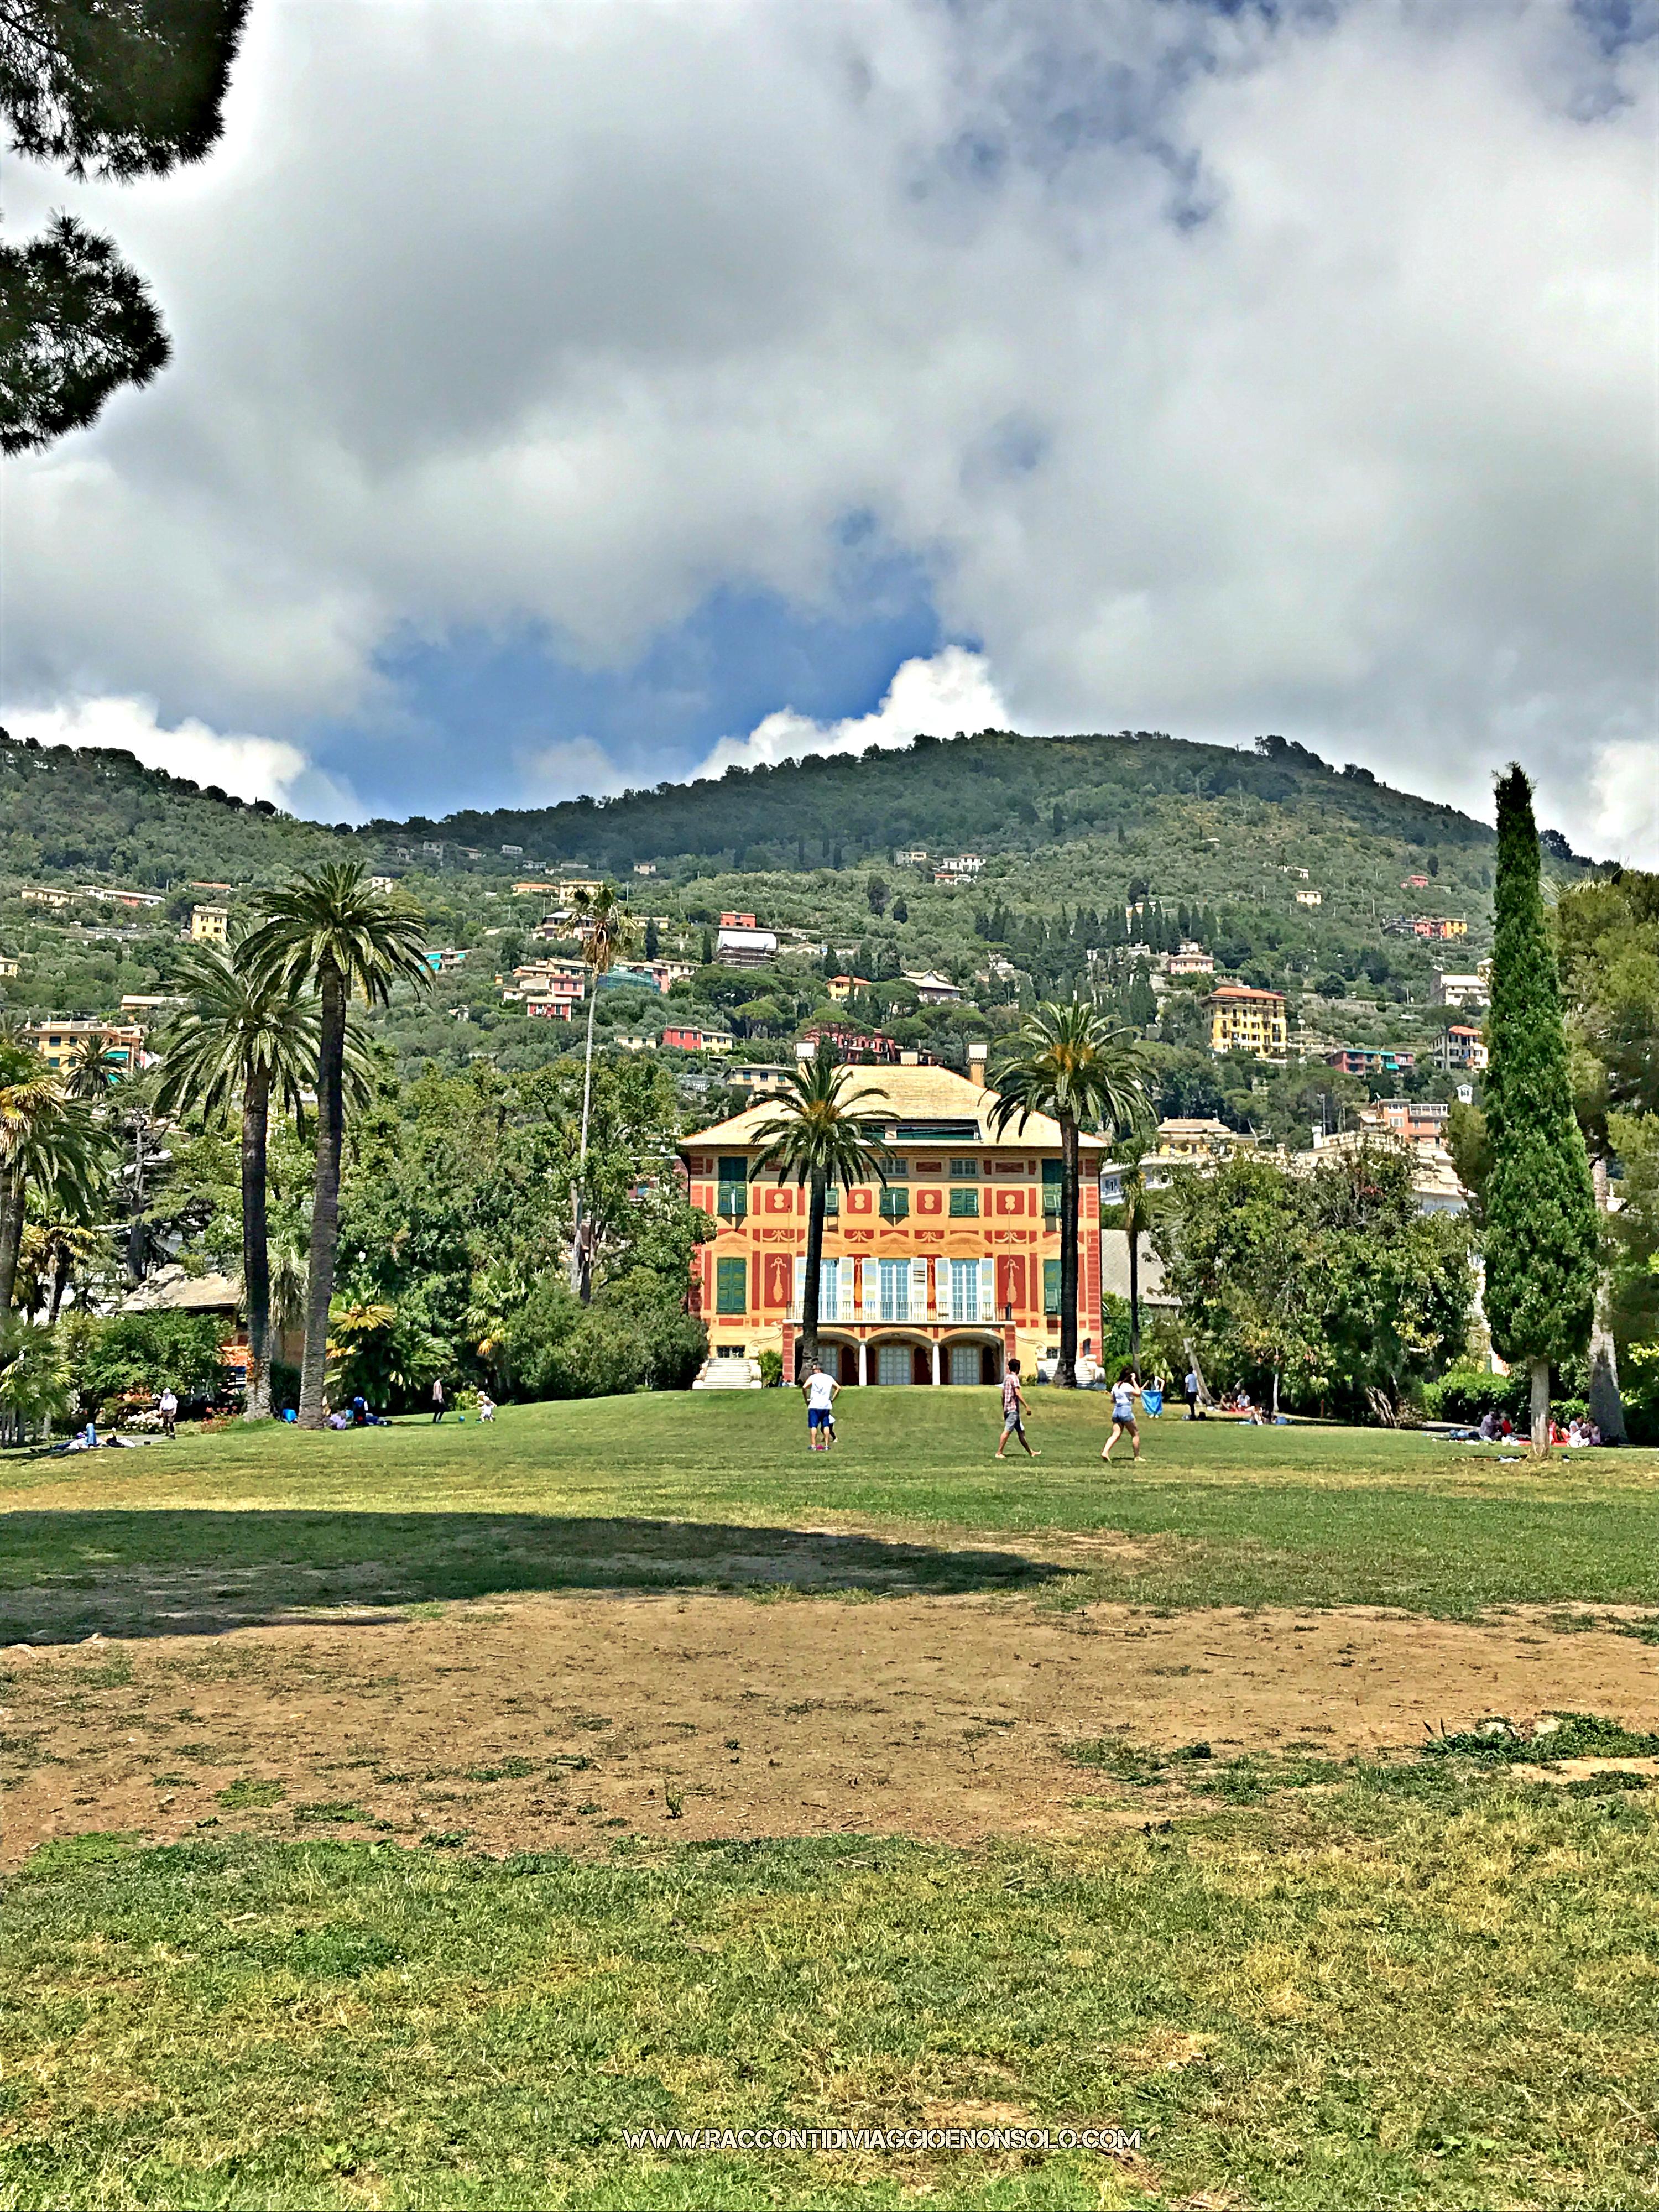 Villa Grimaldi Nervi